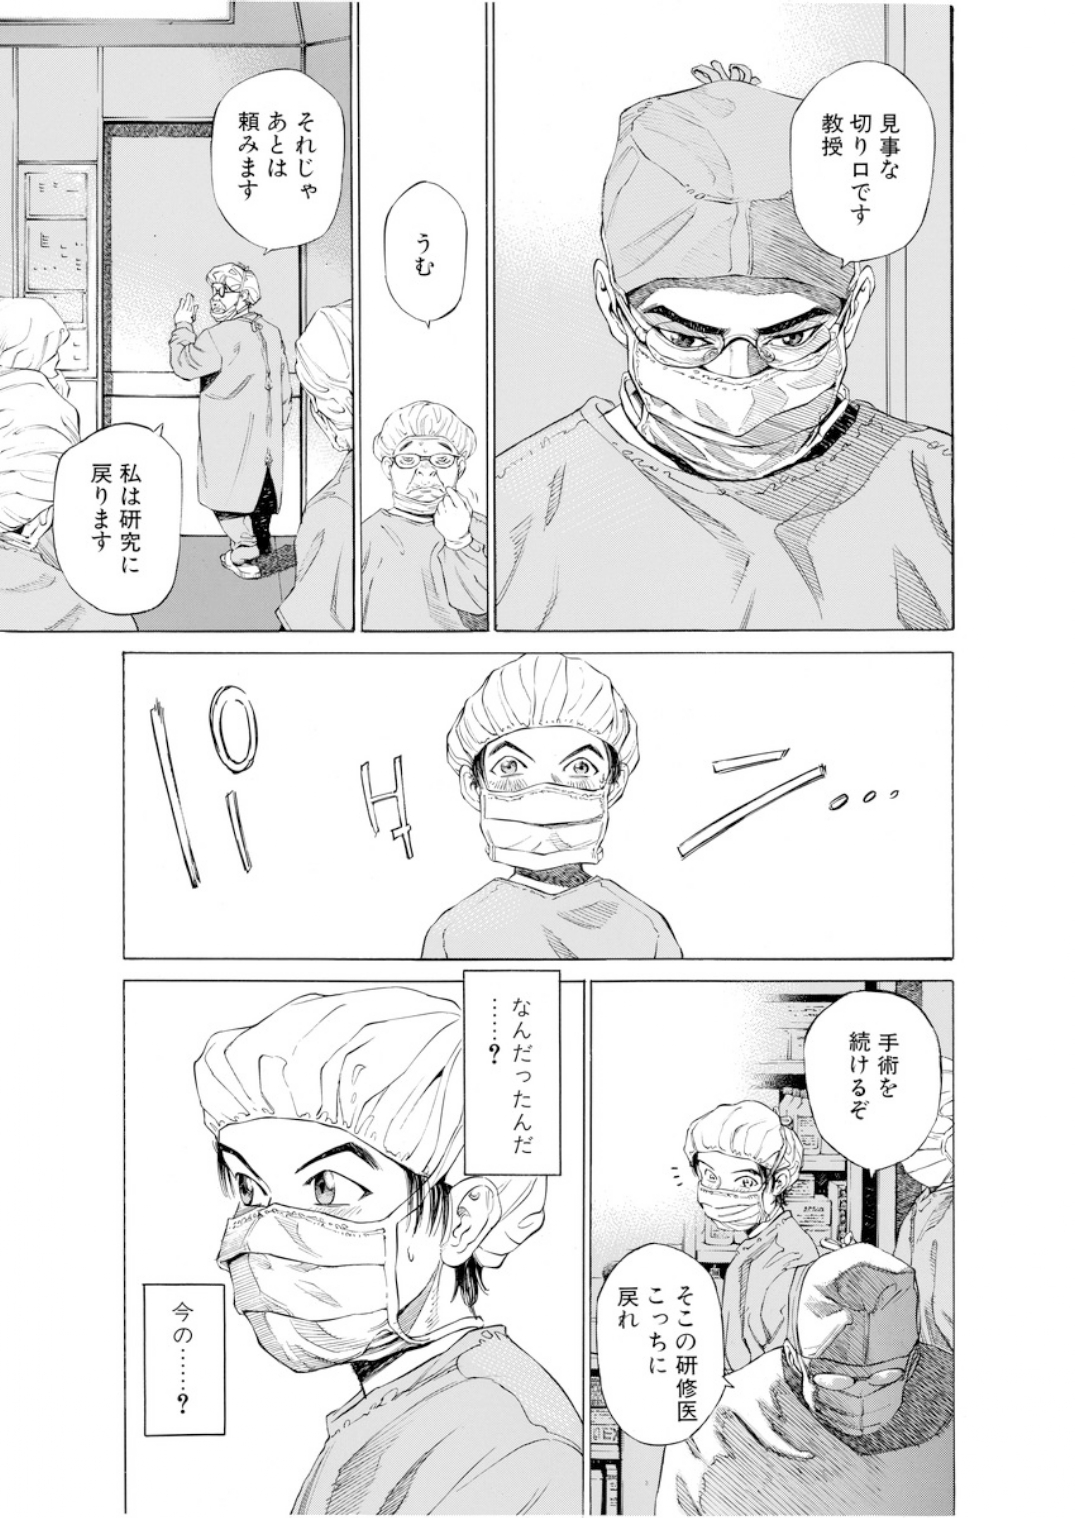 001bj_page-0073.jpg